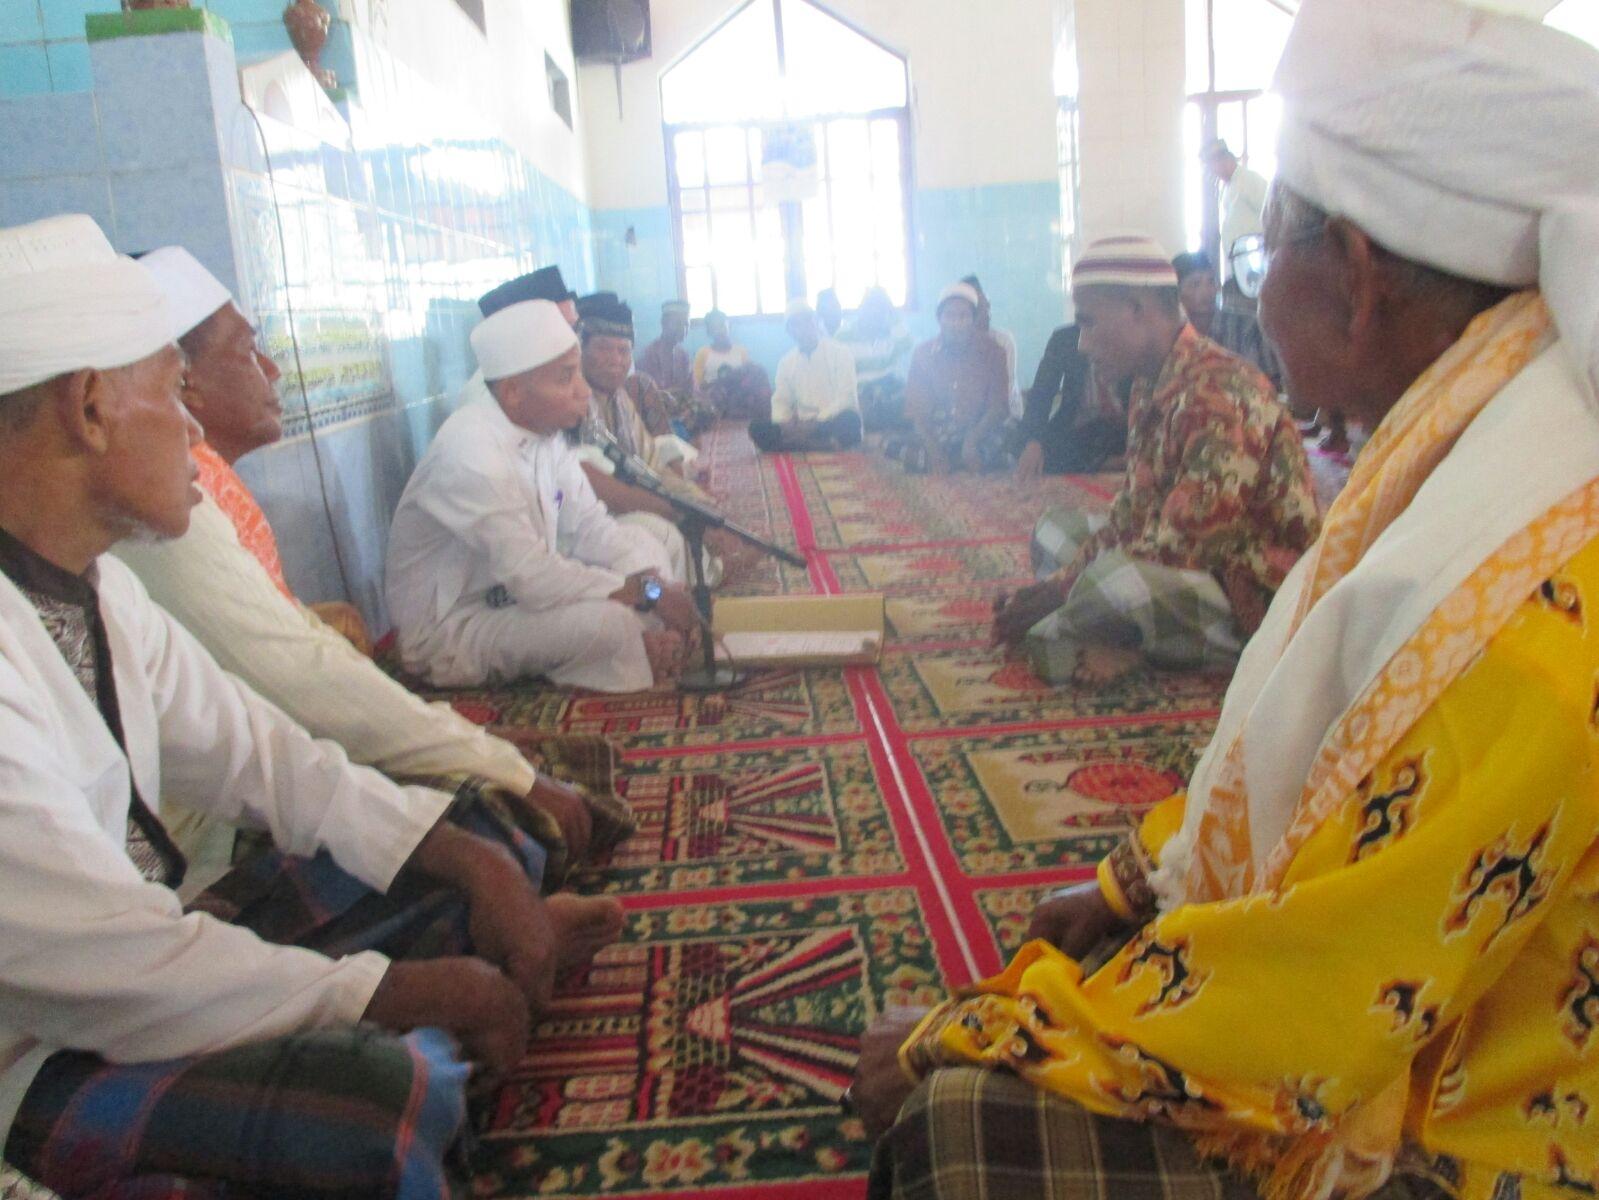 Muallaf Dance Ruppa bersyahadat dibimbing oleh Ust.Syaiful Sulaiman di hadapan para tokoh dan jama'ah Jum'at.